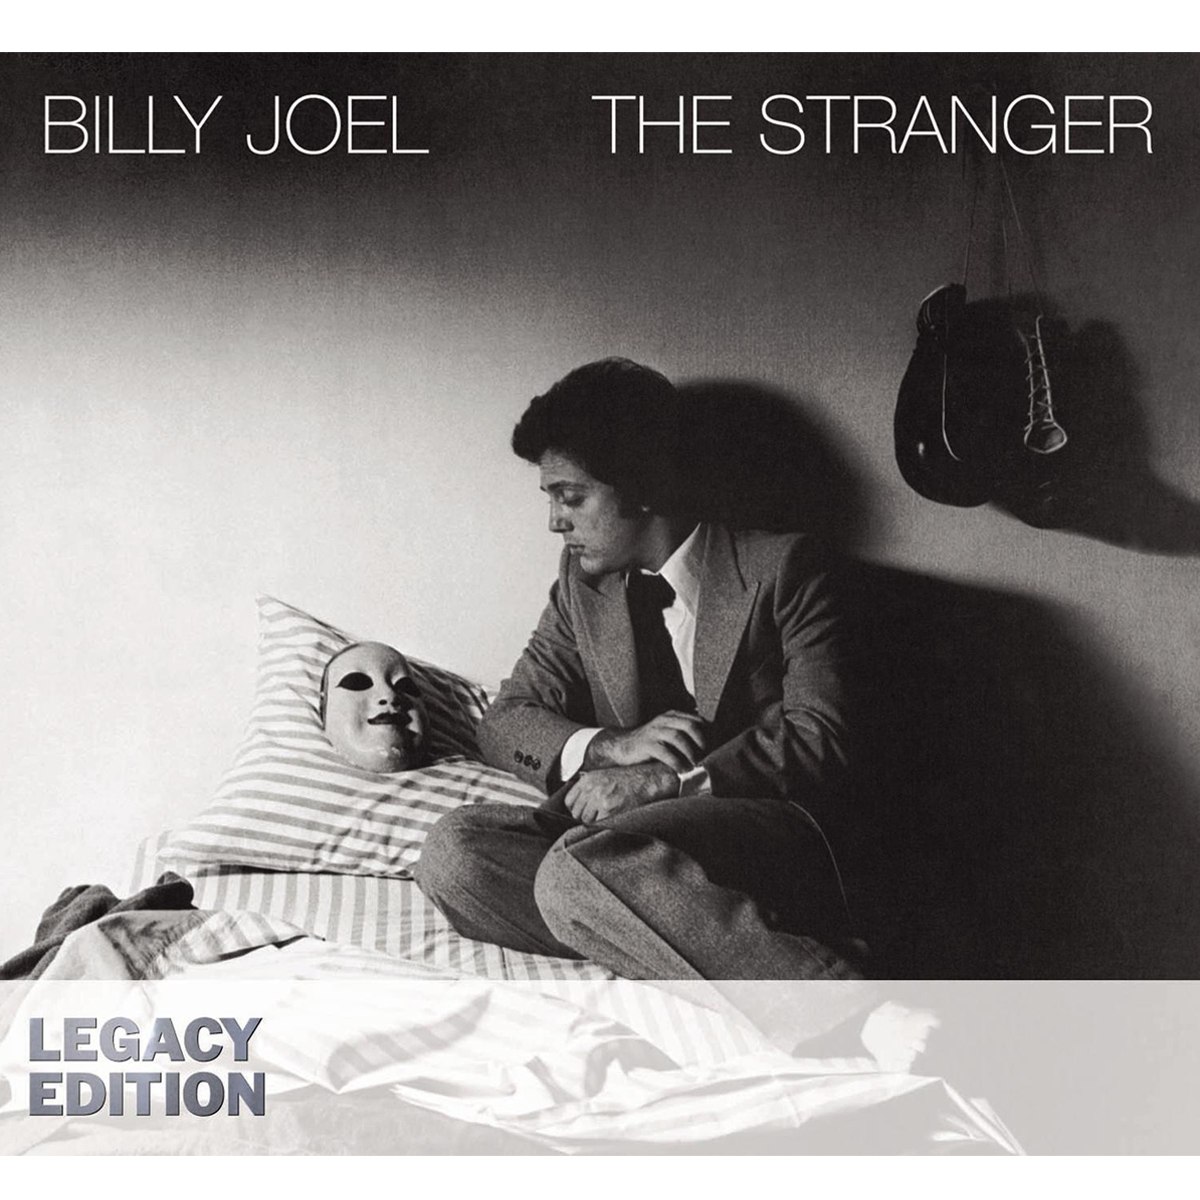 Billy Joel - The Stranger (30th Ann. Legacy Edition) Box Set